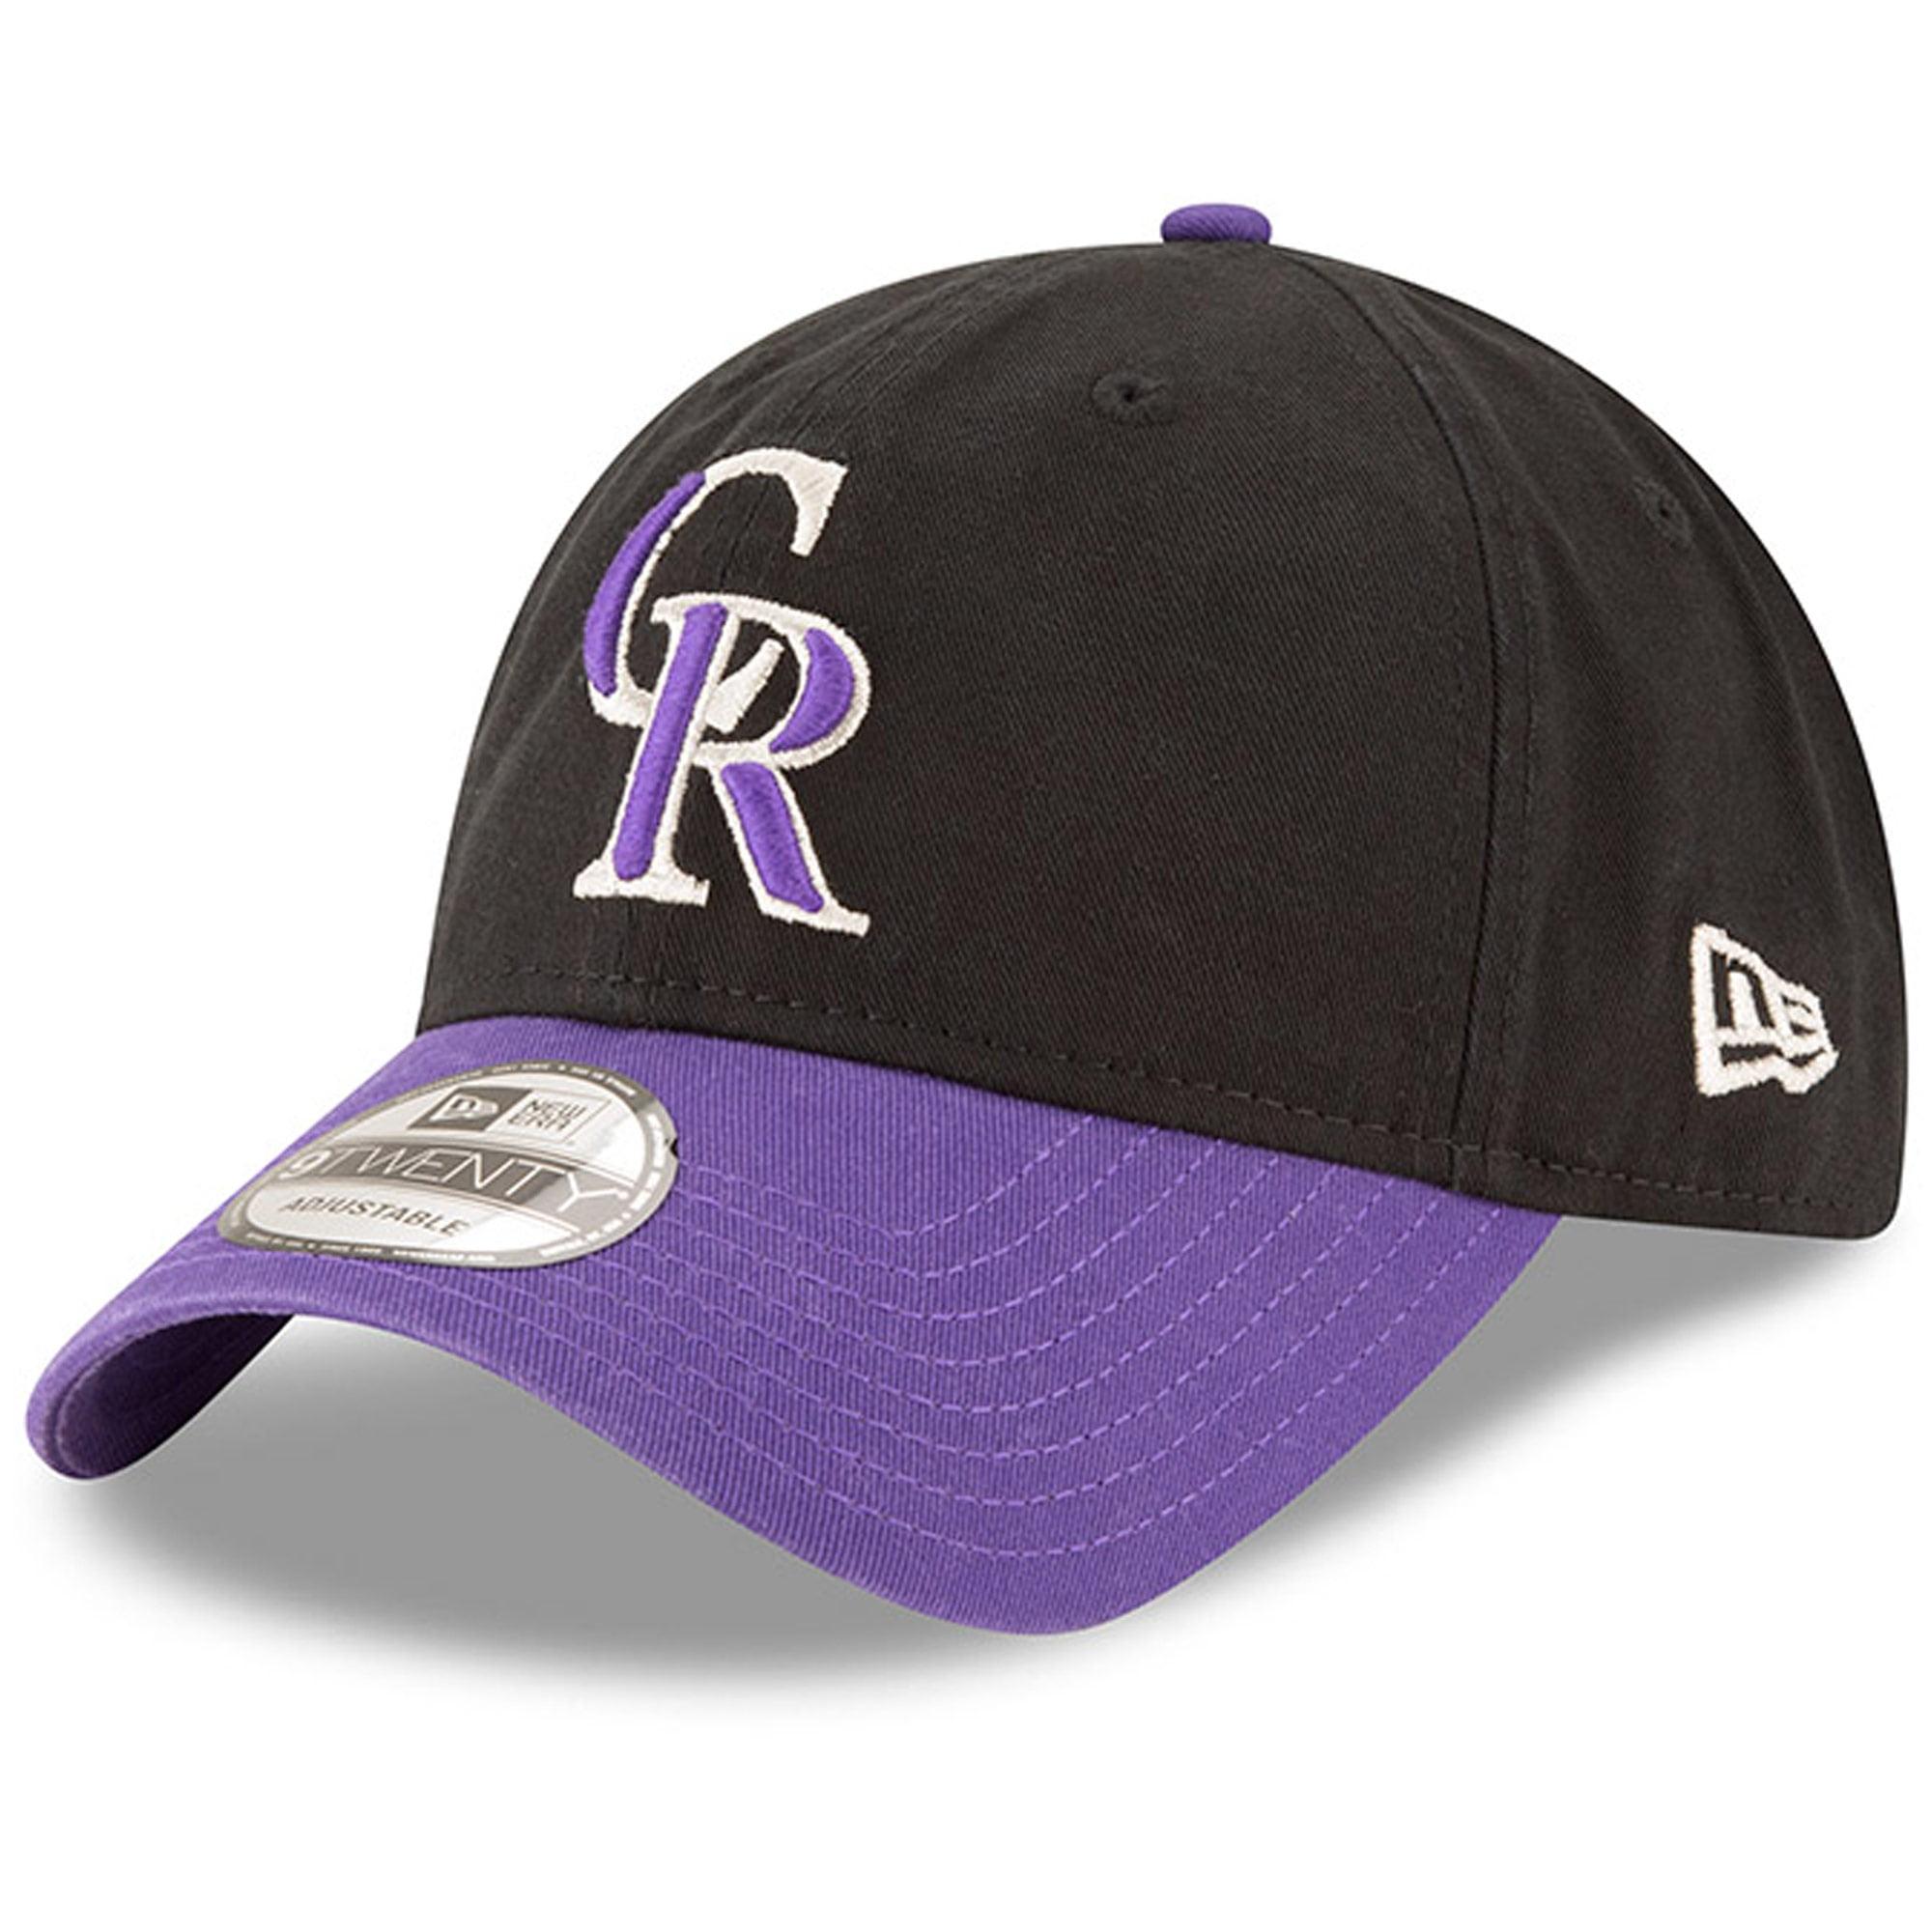 Colorado Rockies New Era Alternate Replica Core Classic 9TWENTY Adjustable Hat - Black/Purple - OSFA